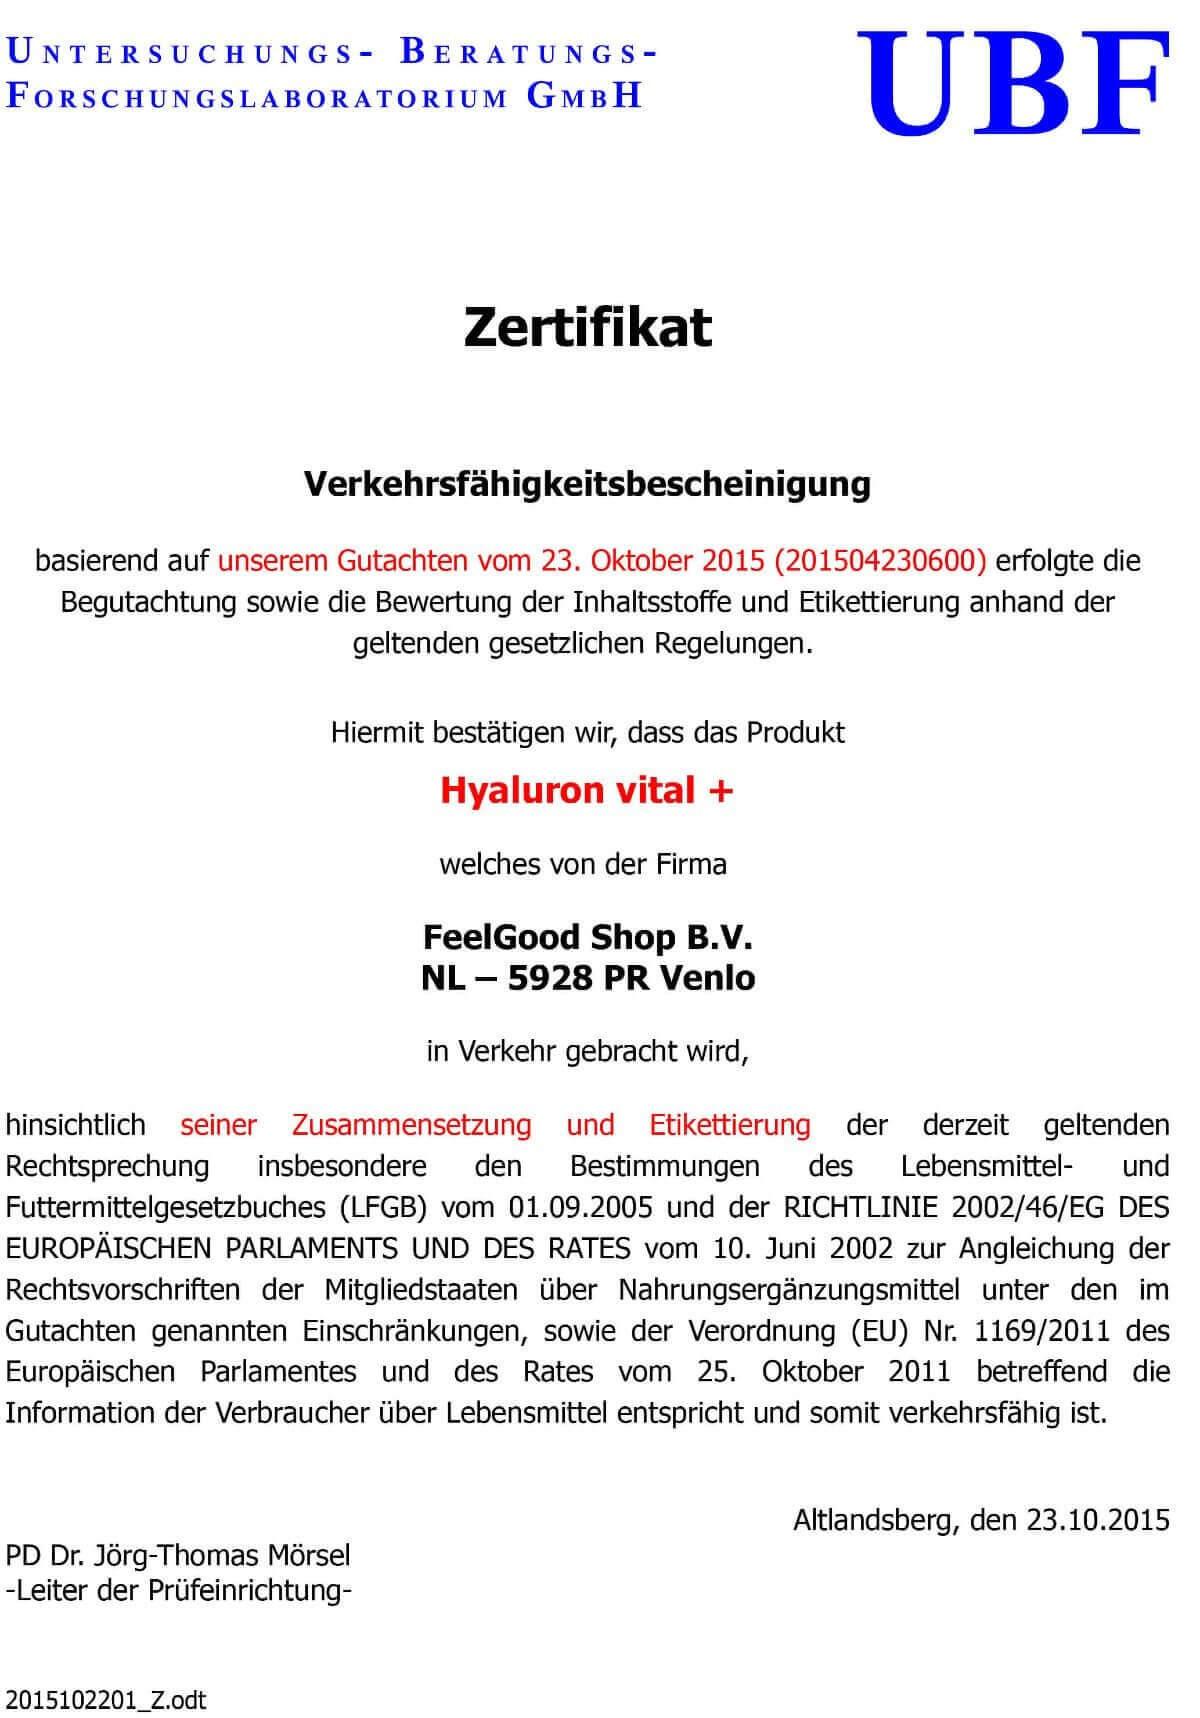 HYALURON VITAL PLUS Kapseln